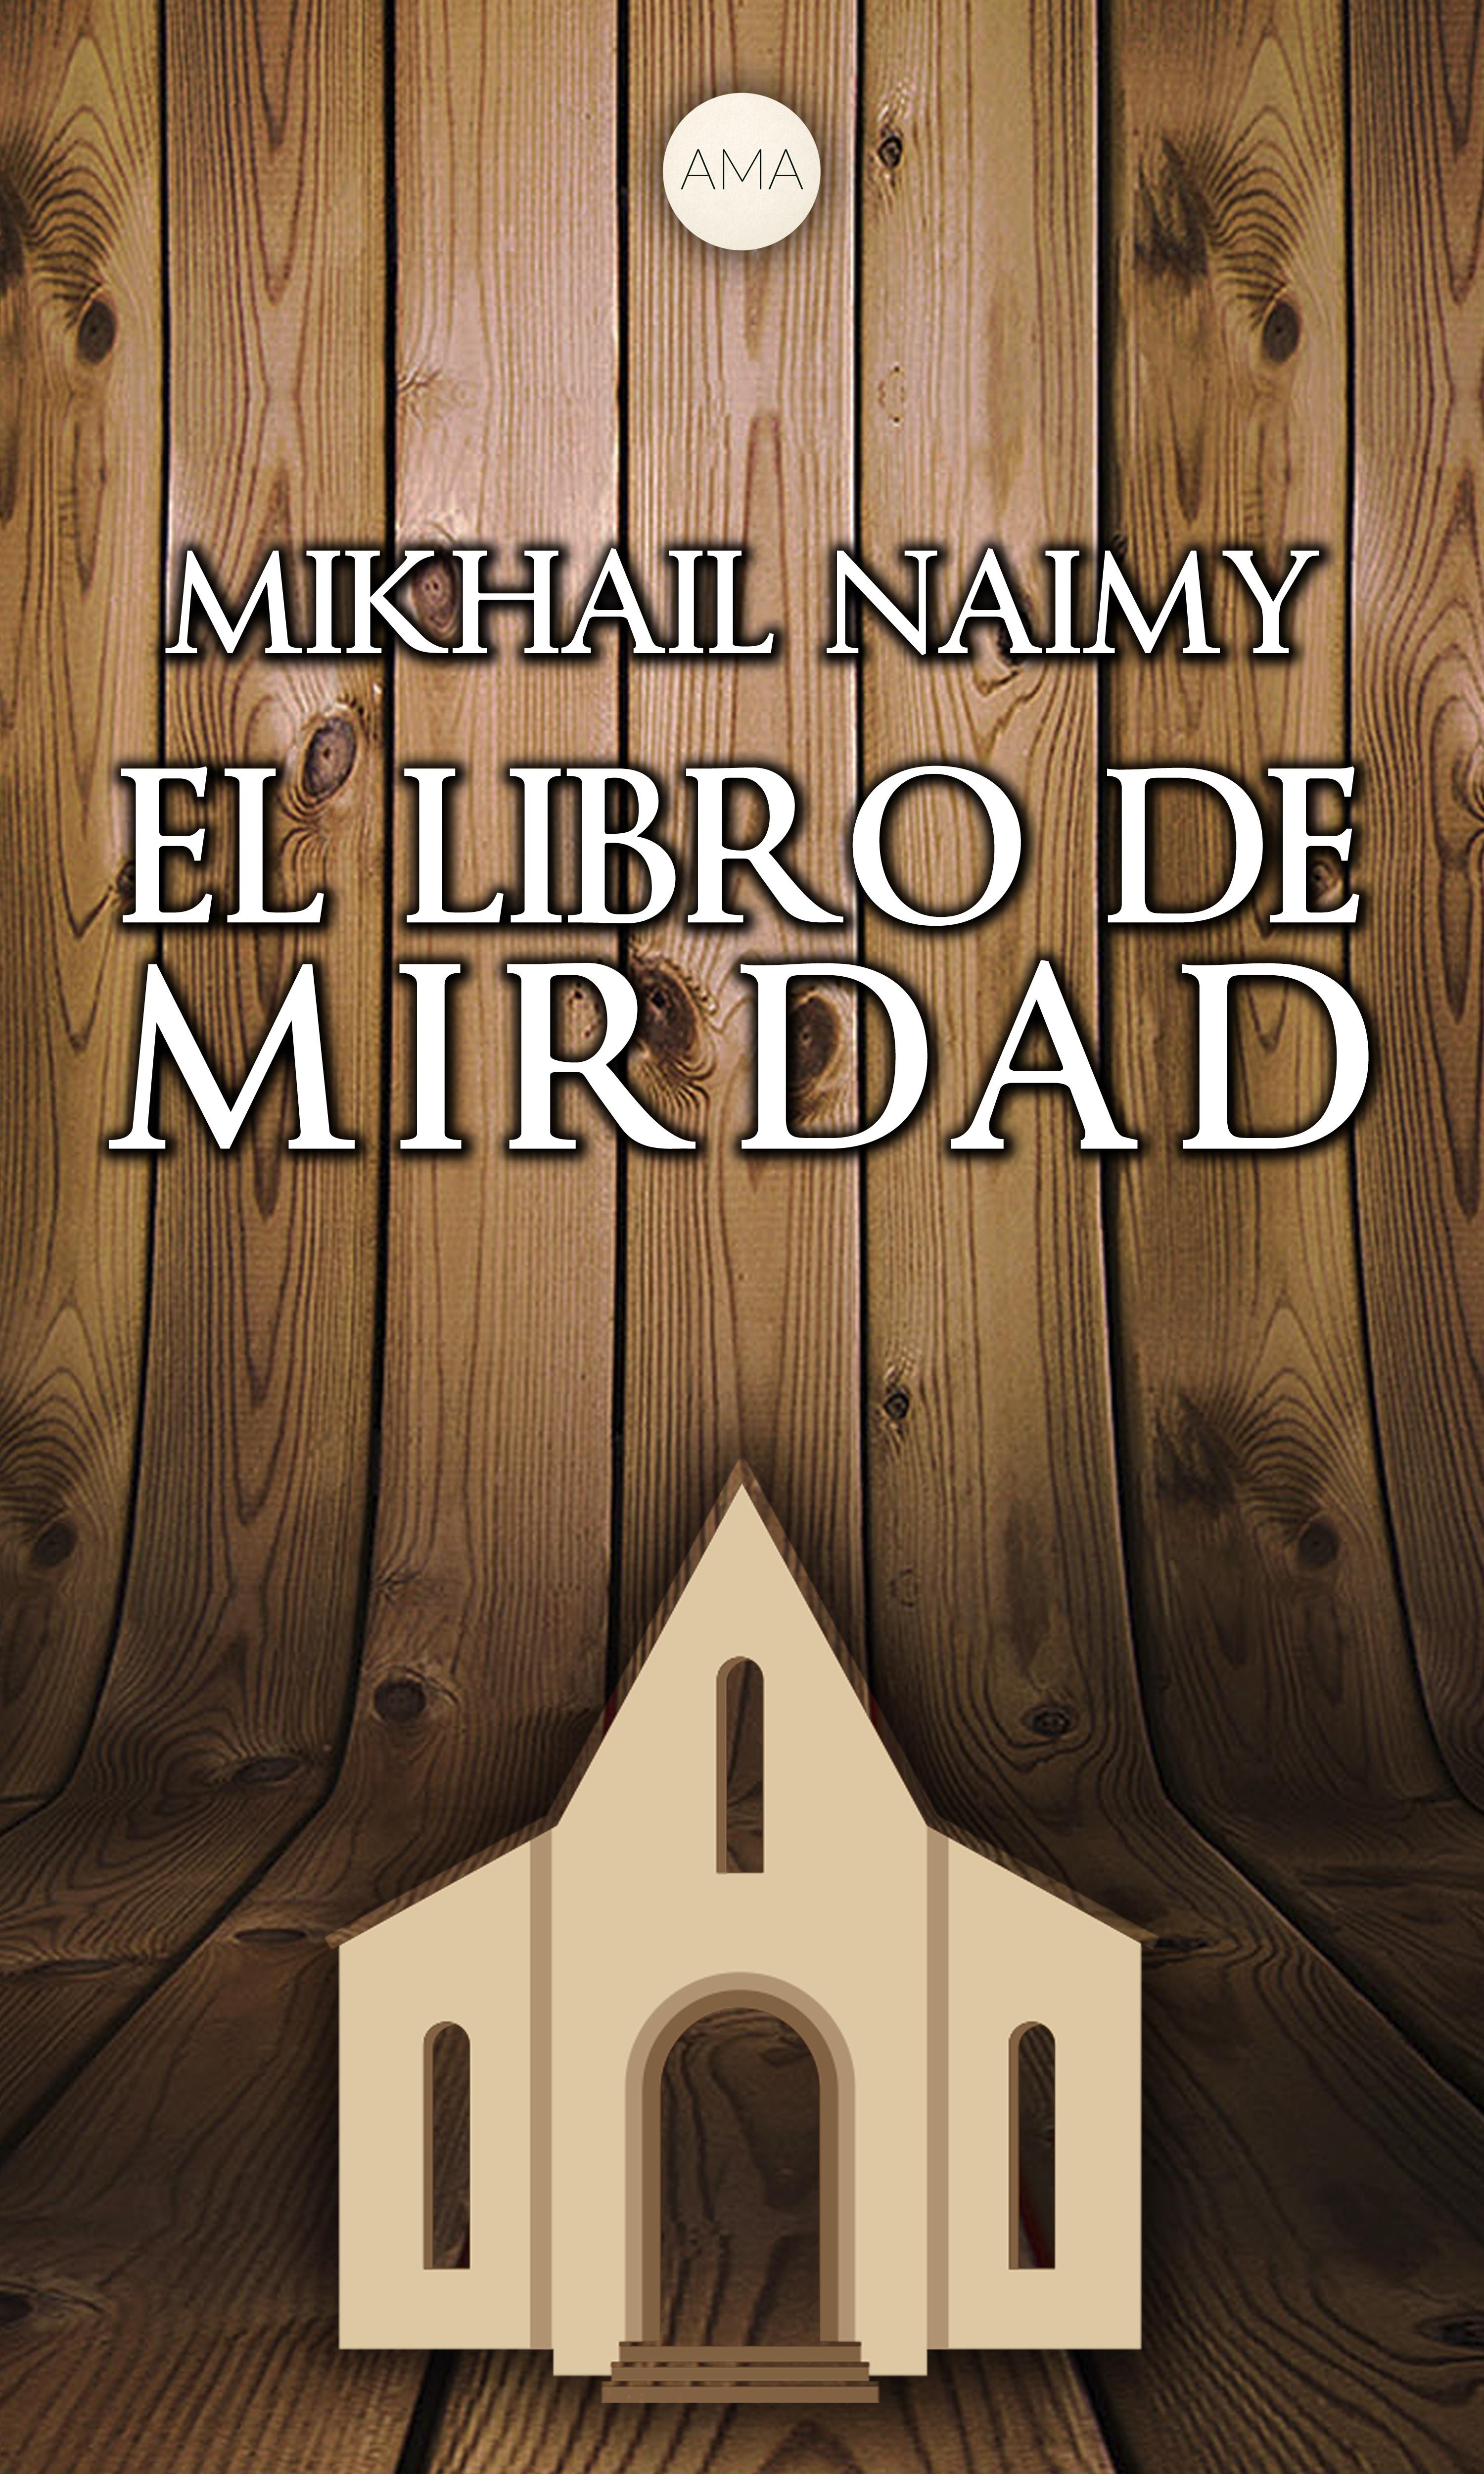 цена на Mikhail Naimy El Libro de Mirdad